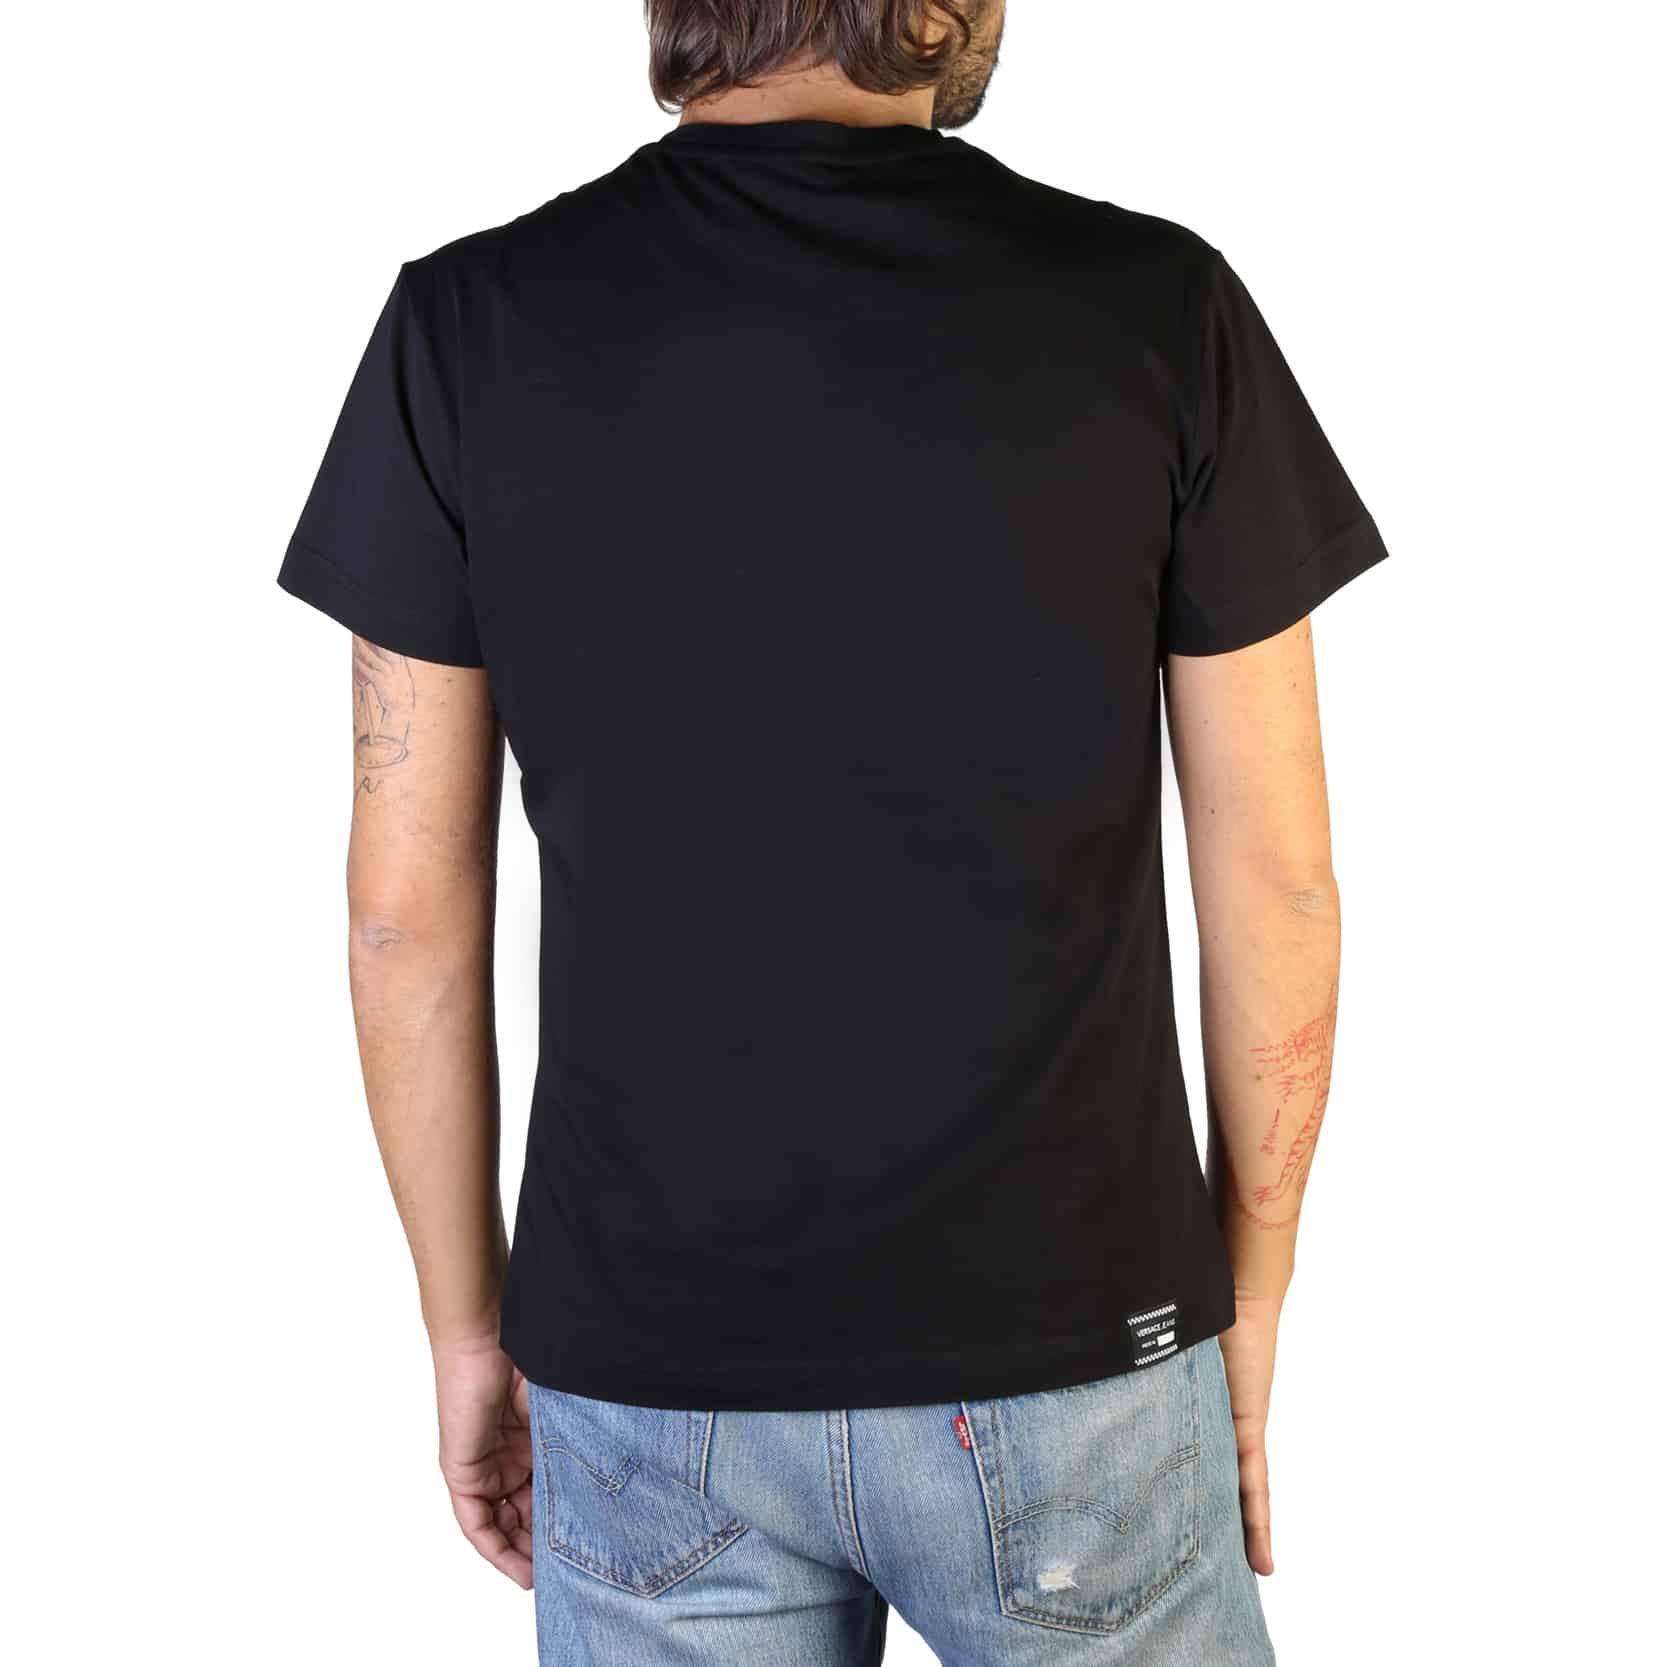 Versace Jeans Man T-shirt Black